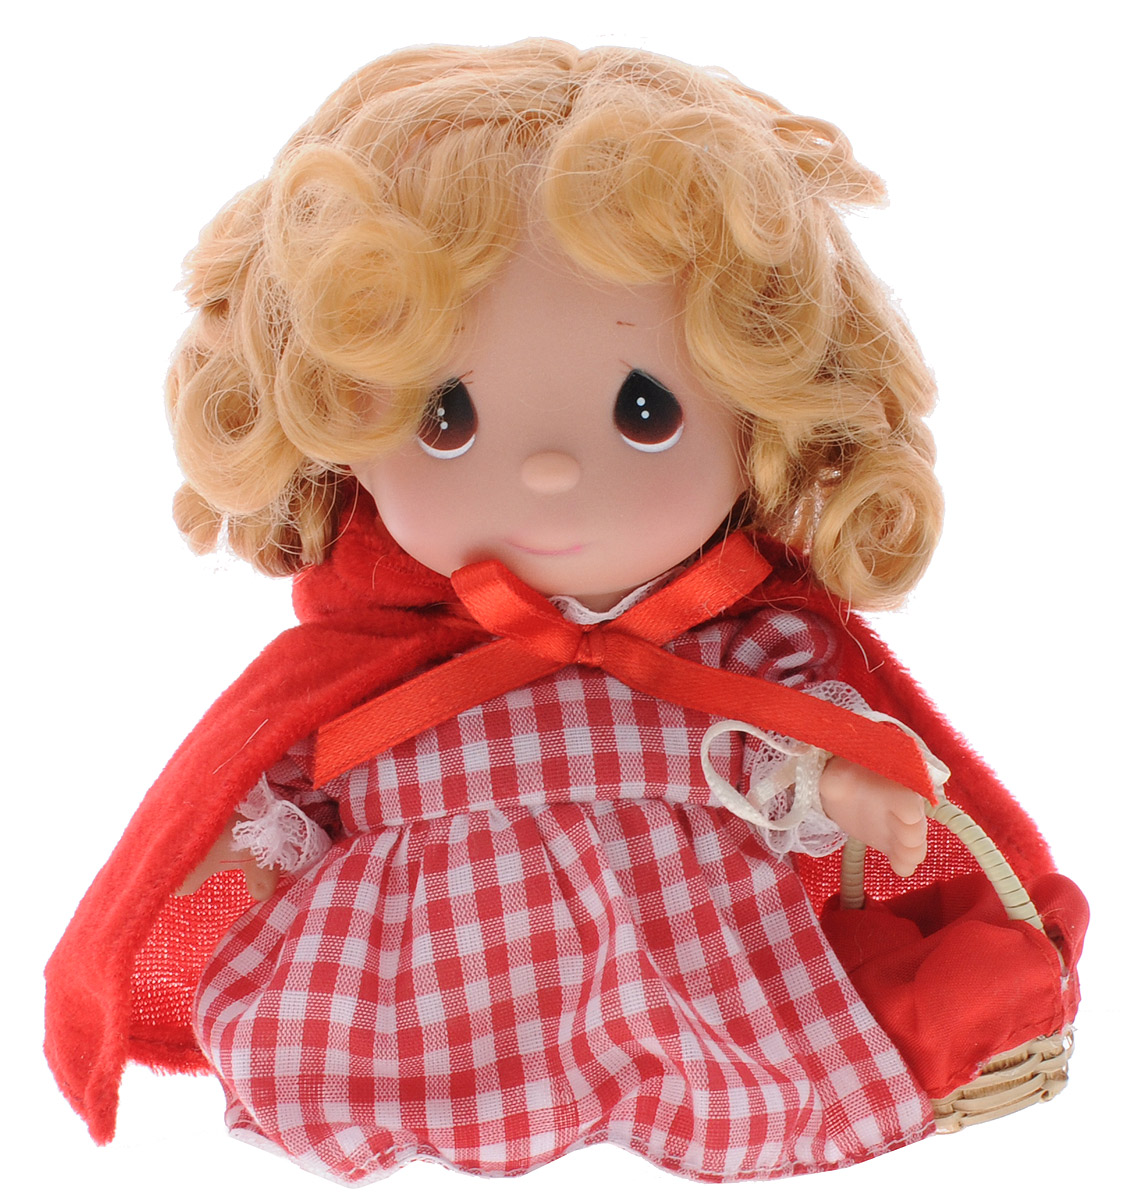 Precious Moments Мини-кукла Красная шапочка precious moments мини кукла пастушка цвет платья светло коралловый